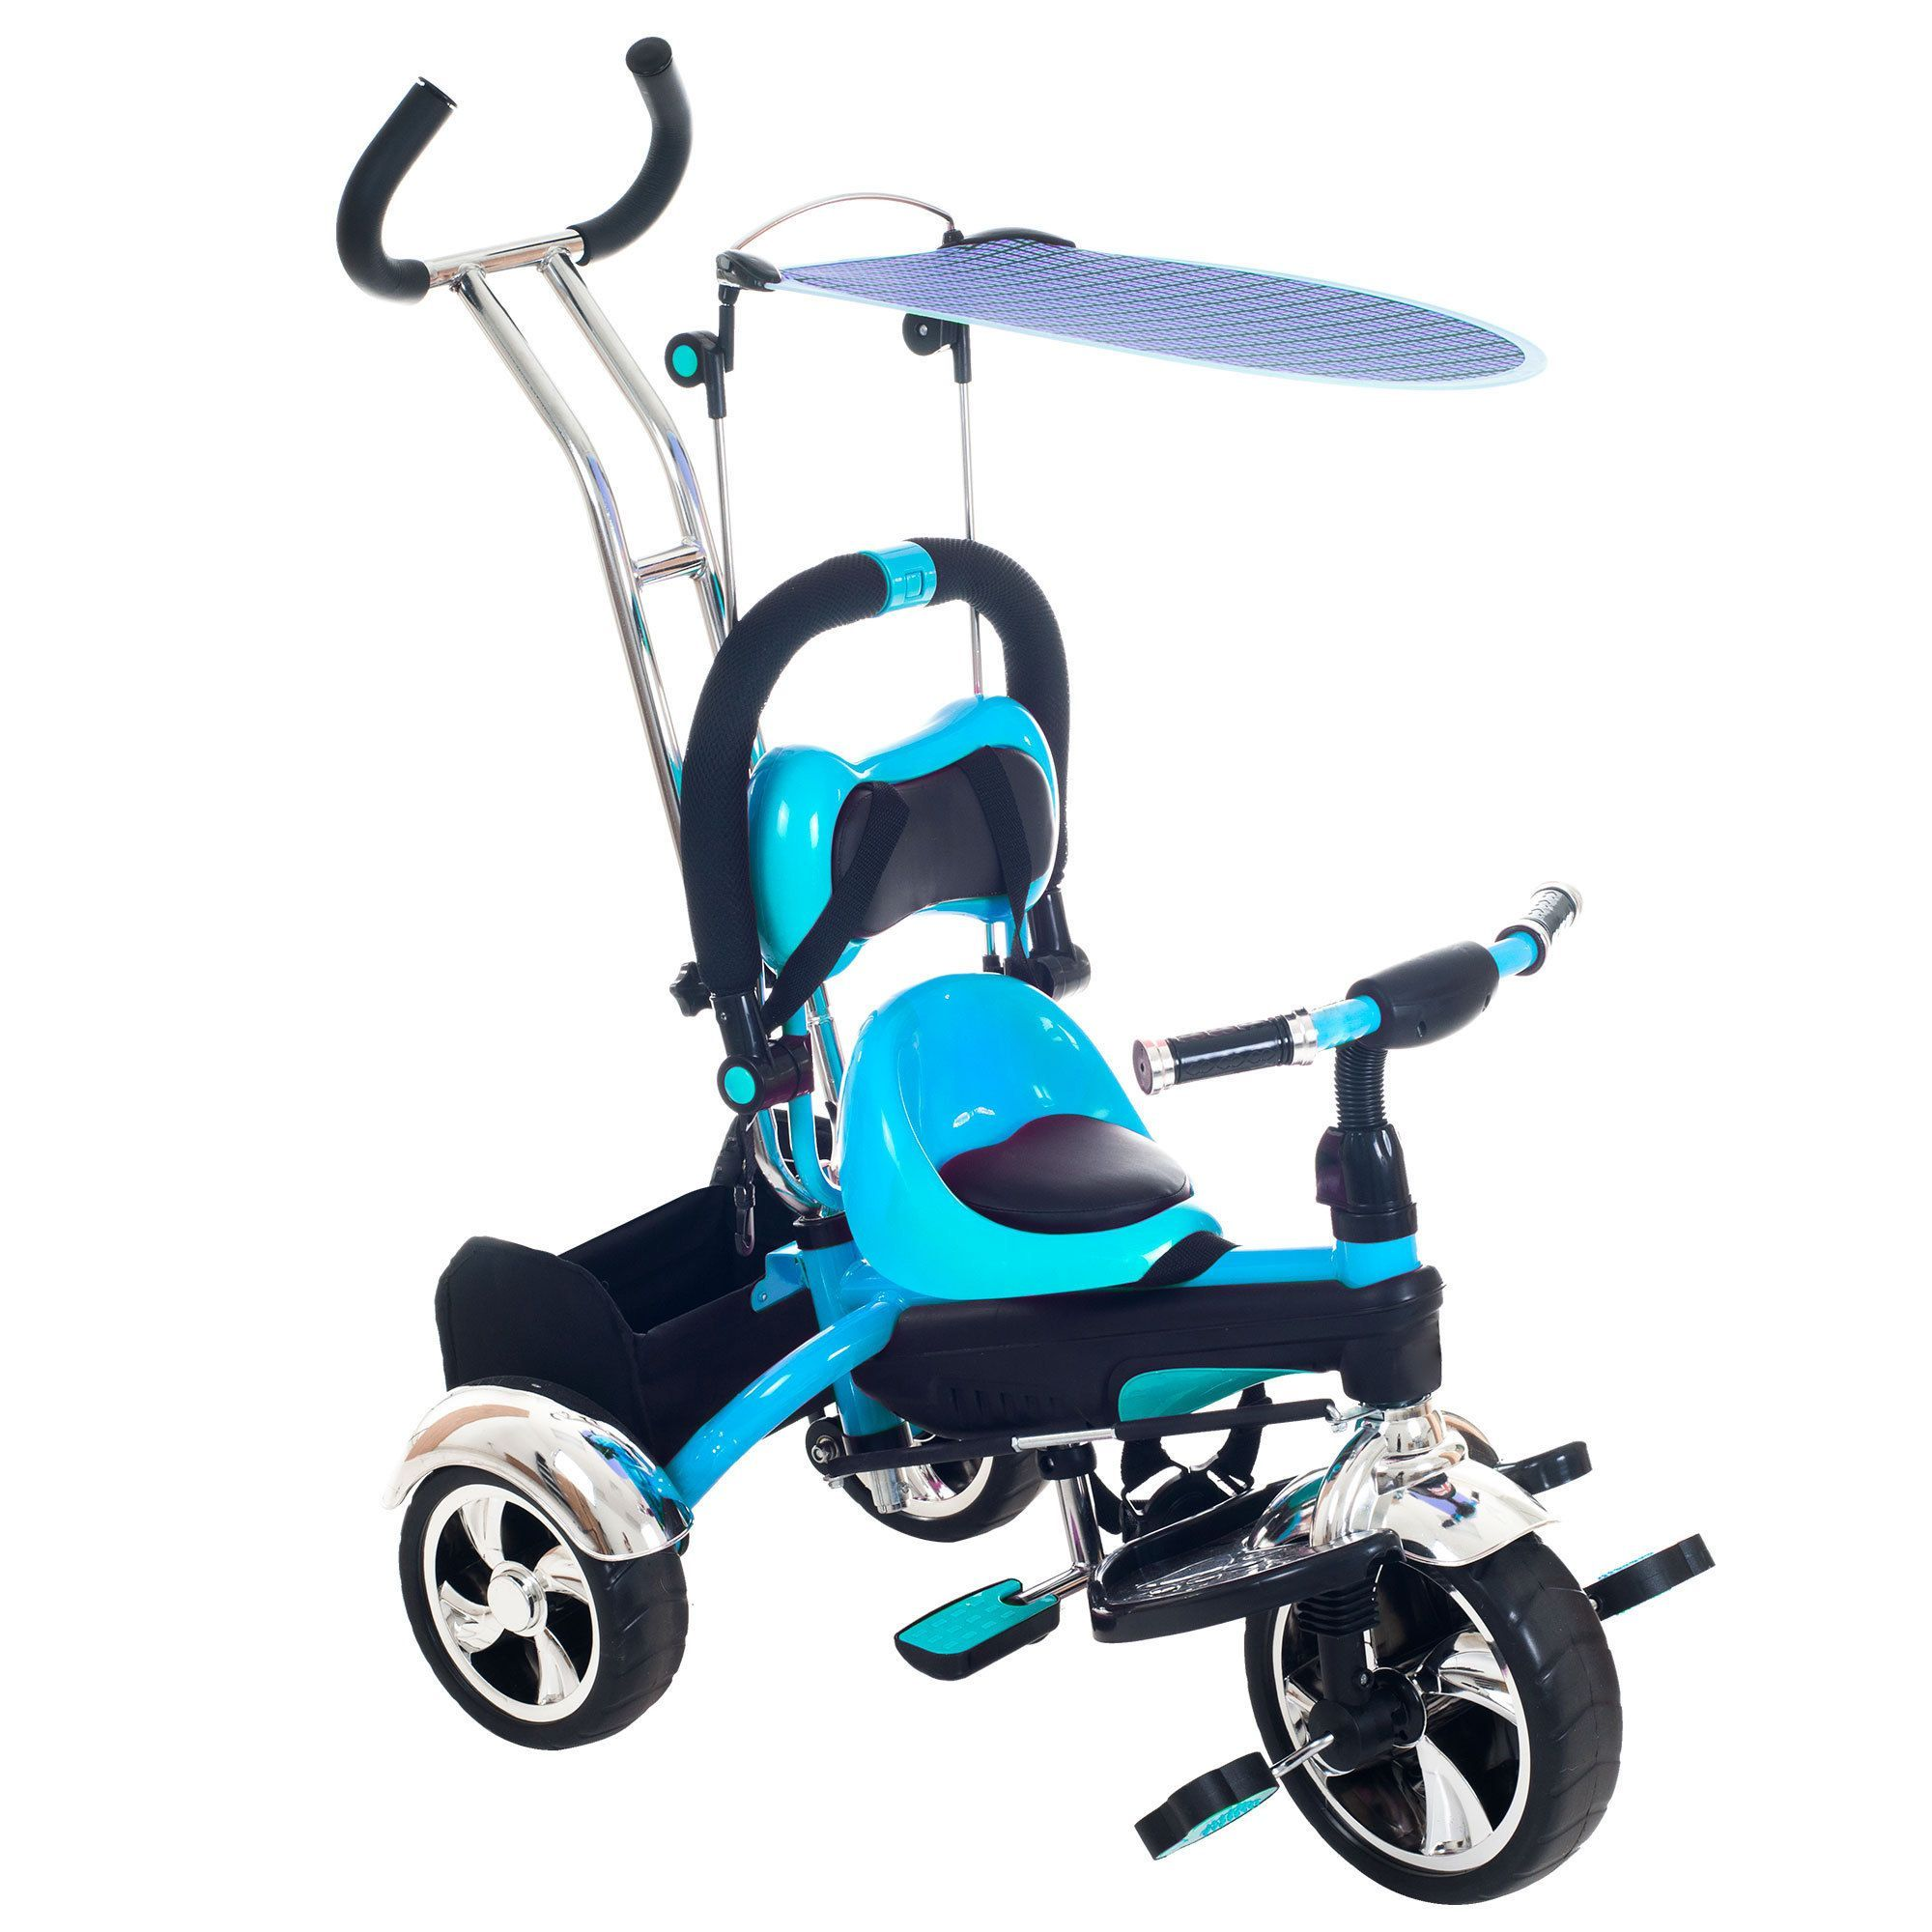 4 In 1 Ride-On Toys Baby Toddler Pram Tricycle Bike Trike Stroller Kids Canopy